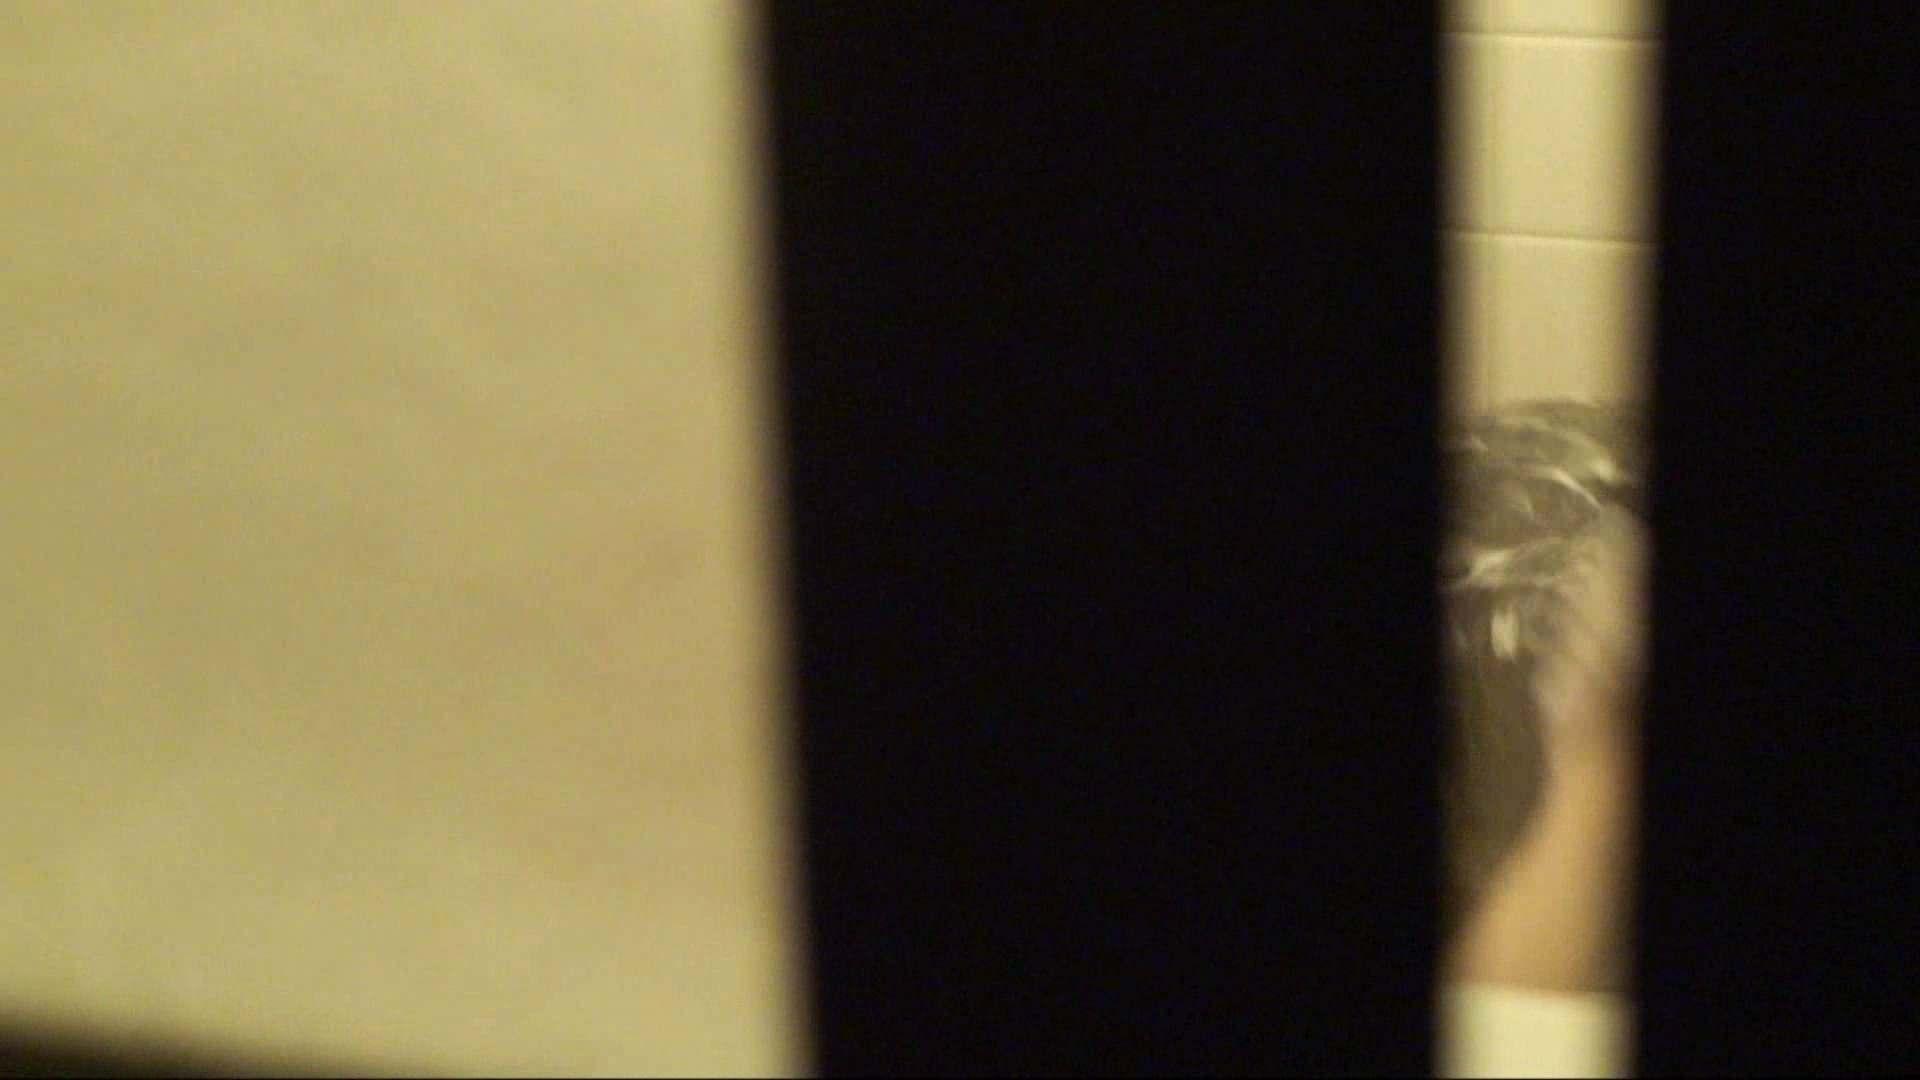 vol.02超可愛すぎる彼女の裸体をハイビジョンで!至近距離での眺め最高! エッチな盗撮 オマンコ動画キャプチャ 78pic 21